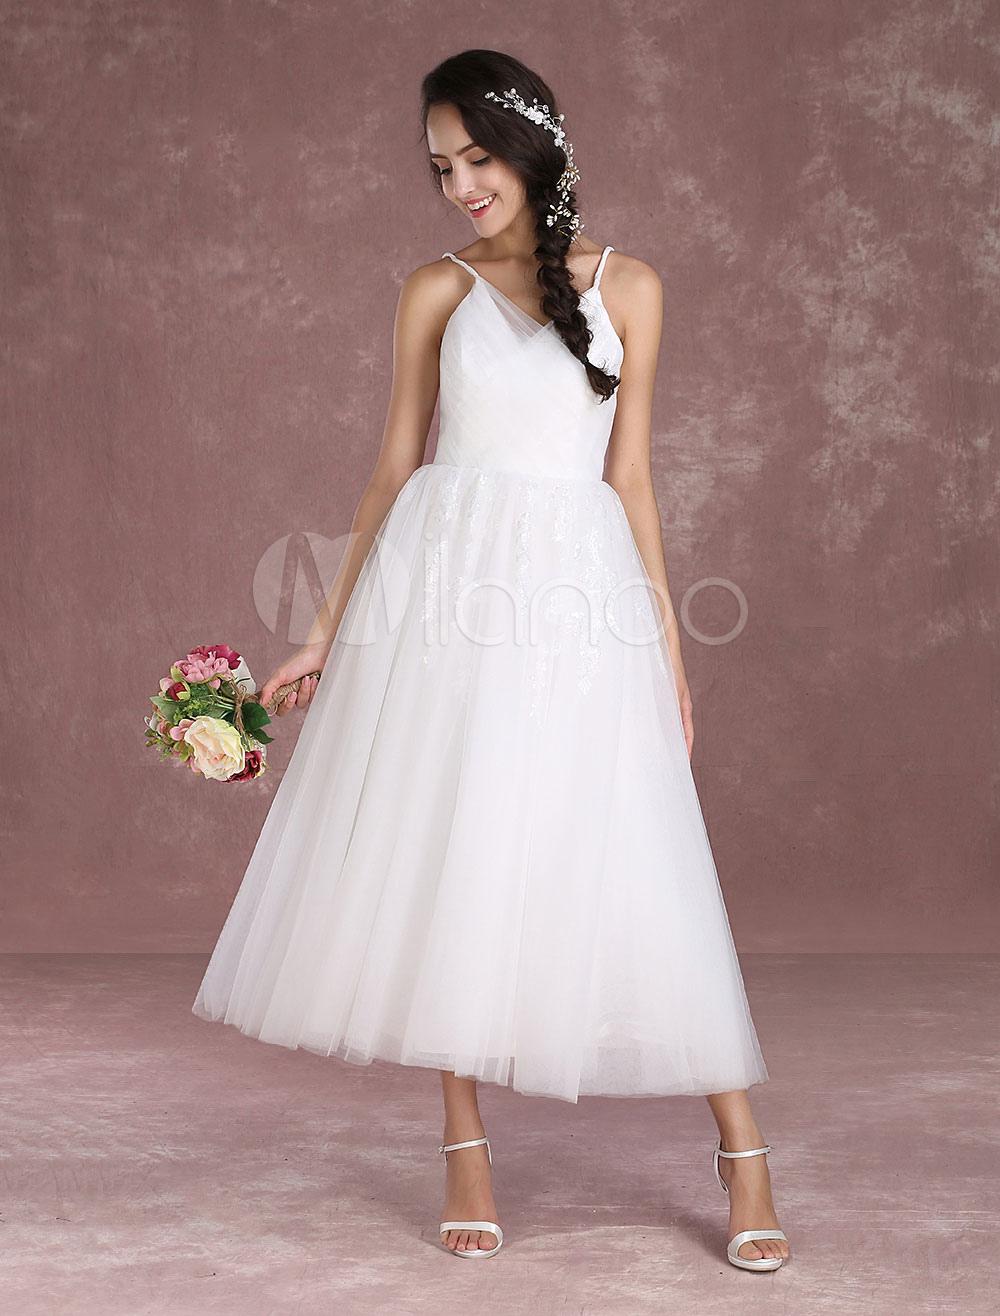 Buy Summer Wedding Dresses 2018 Short Beach Tulle Bridal Dress V Neck Spaghetti Straps Ankle Length Bridal Gown Milanoo for $161.09 in Milanoo store